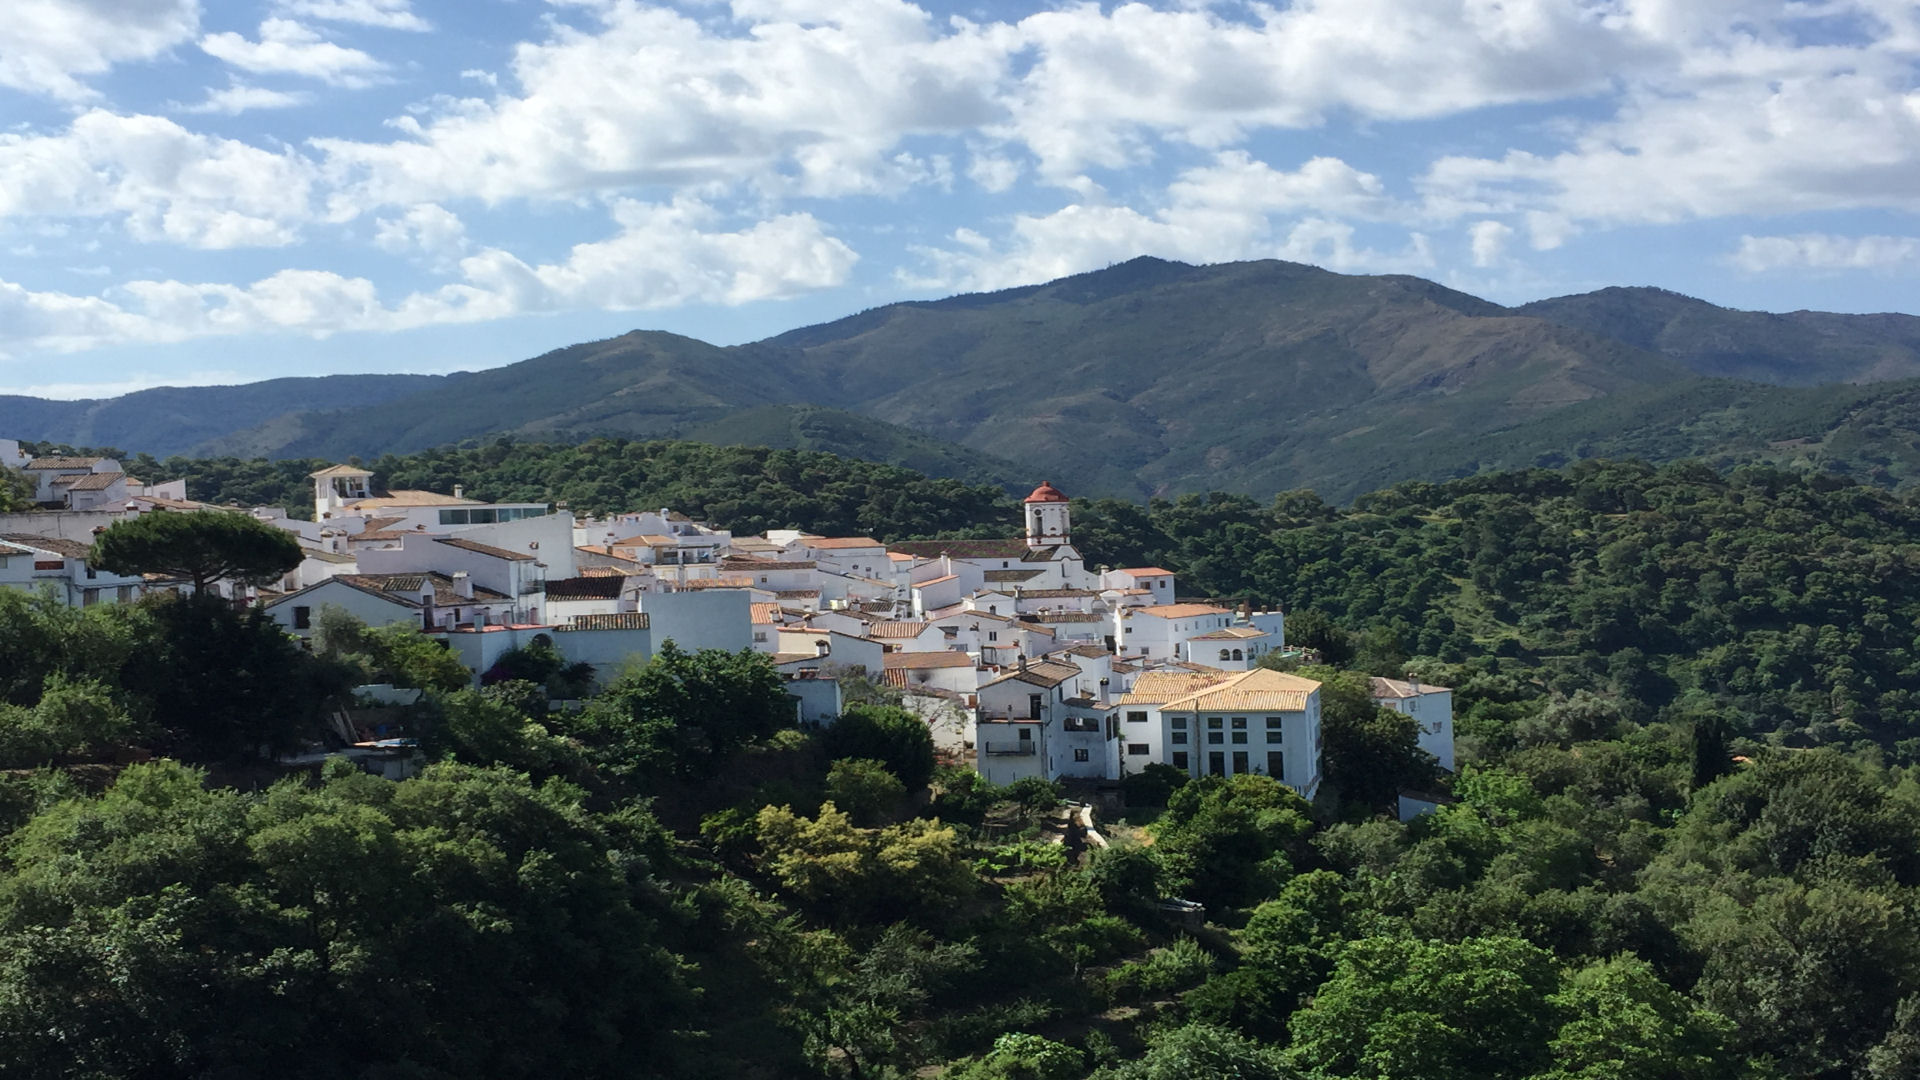 Genalguacil - a short drive from luxury villa rental in Ronda, Spain